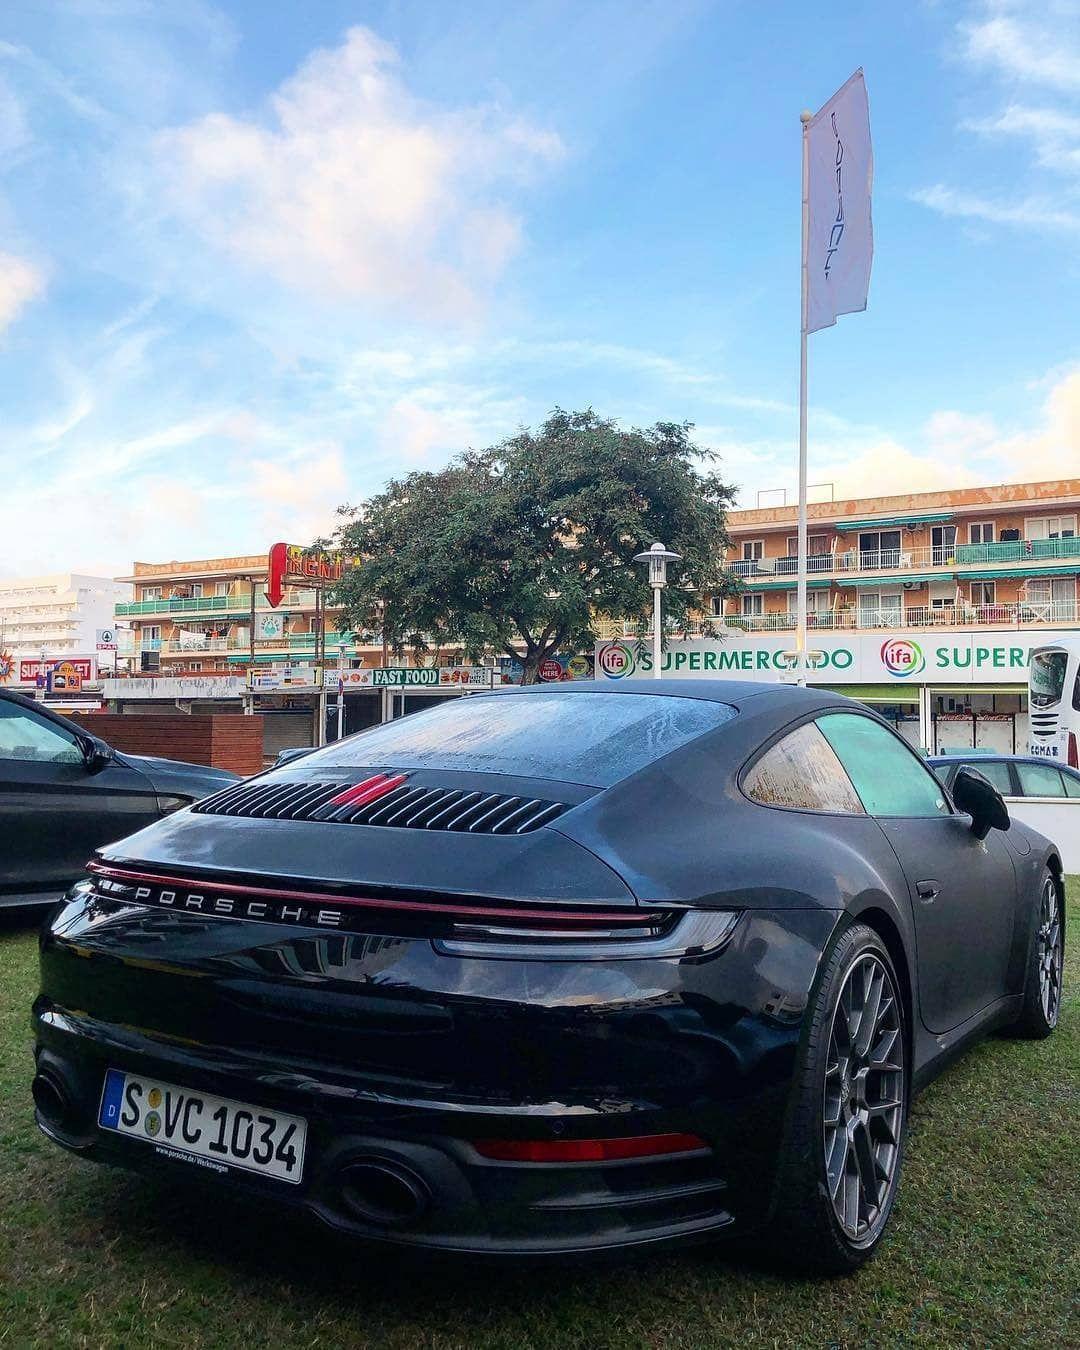 Instagram Porsche 992 Fanpage Porsche Voiture Iconique Porsche Porsche911 Porsche992 Montre Voiture Super Voiture Voitures De Sport Haut De Gamme